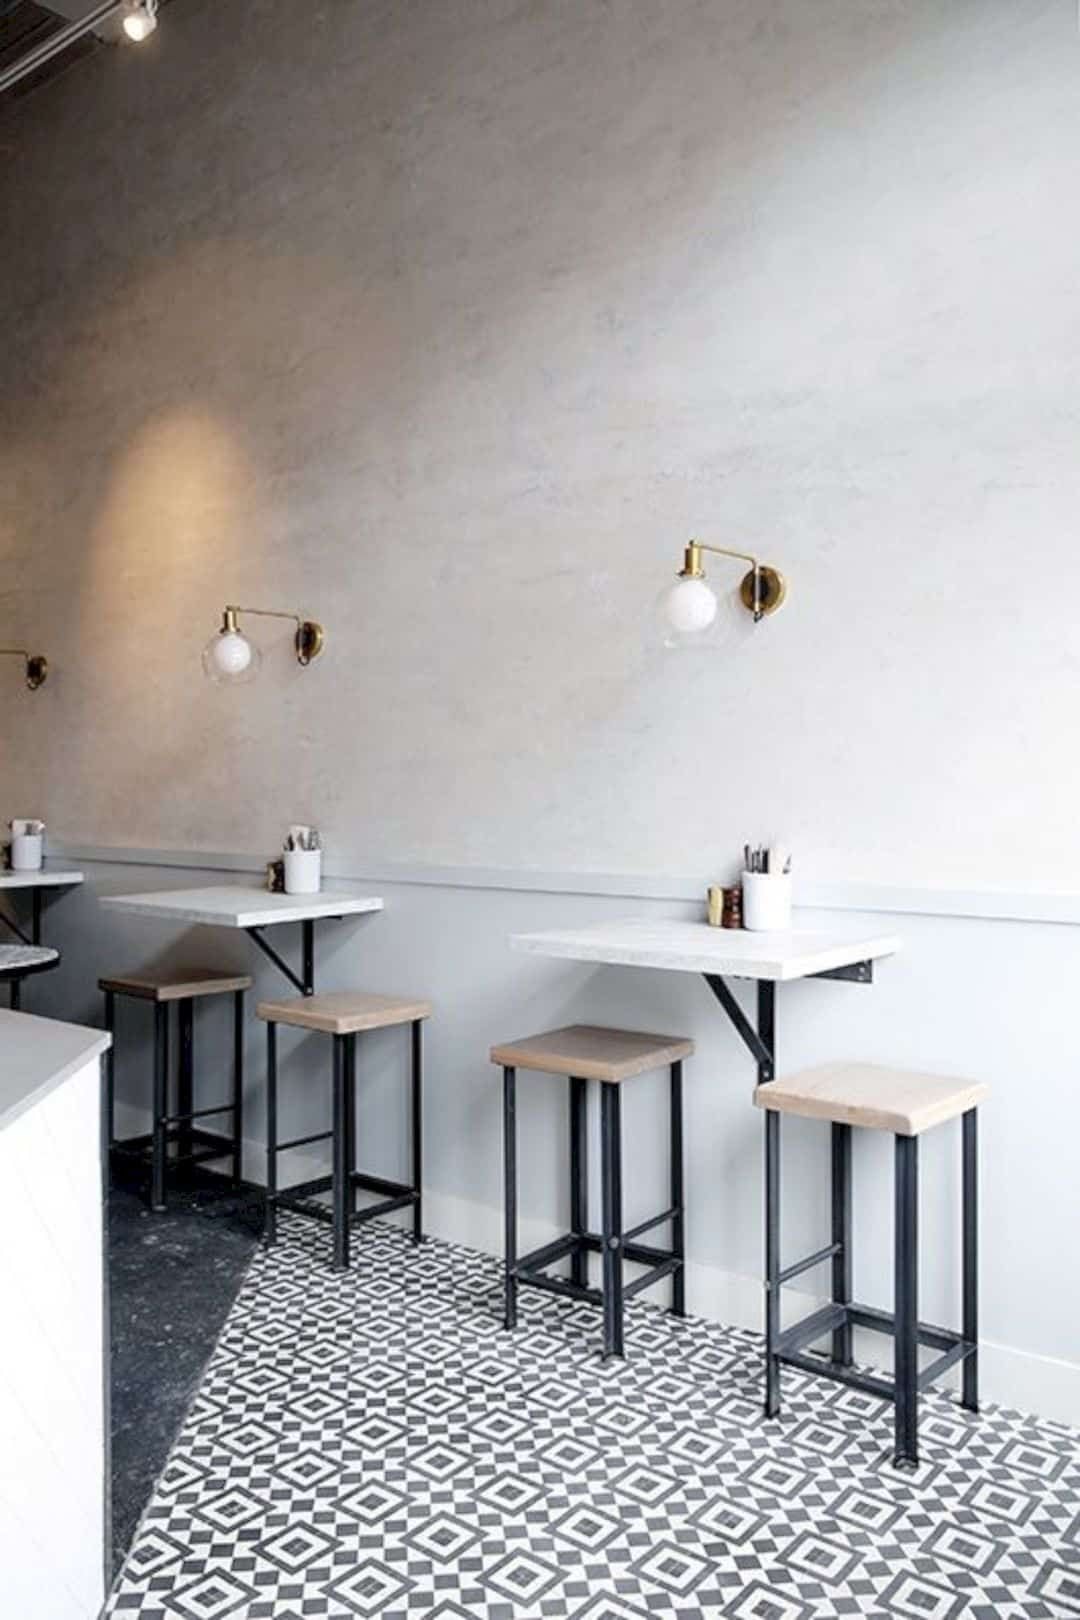 15 Great Interior Design Ideas for Small Restaurant #smallrestaurants